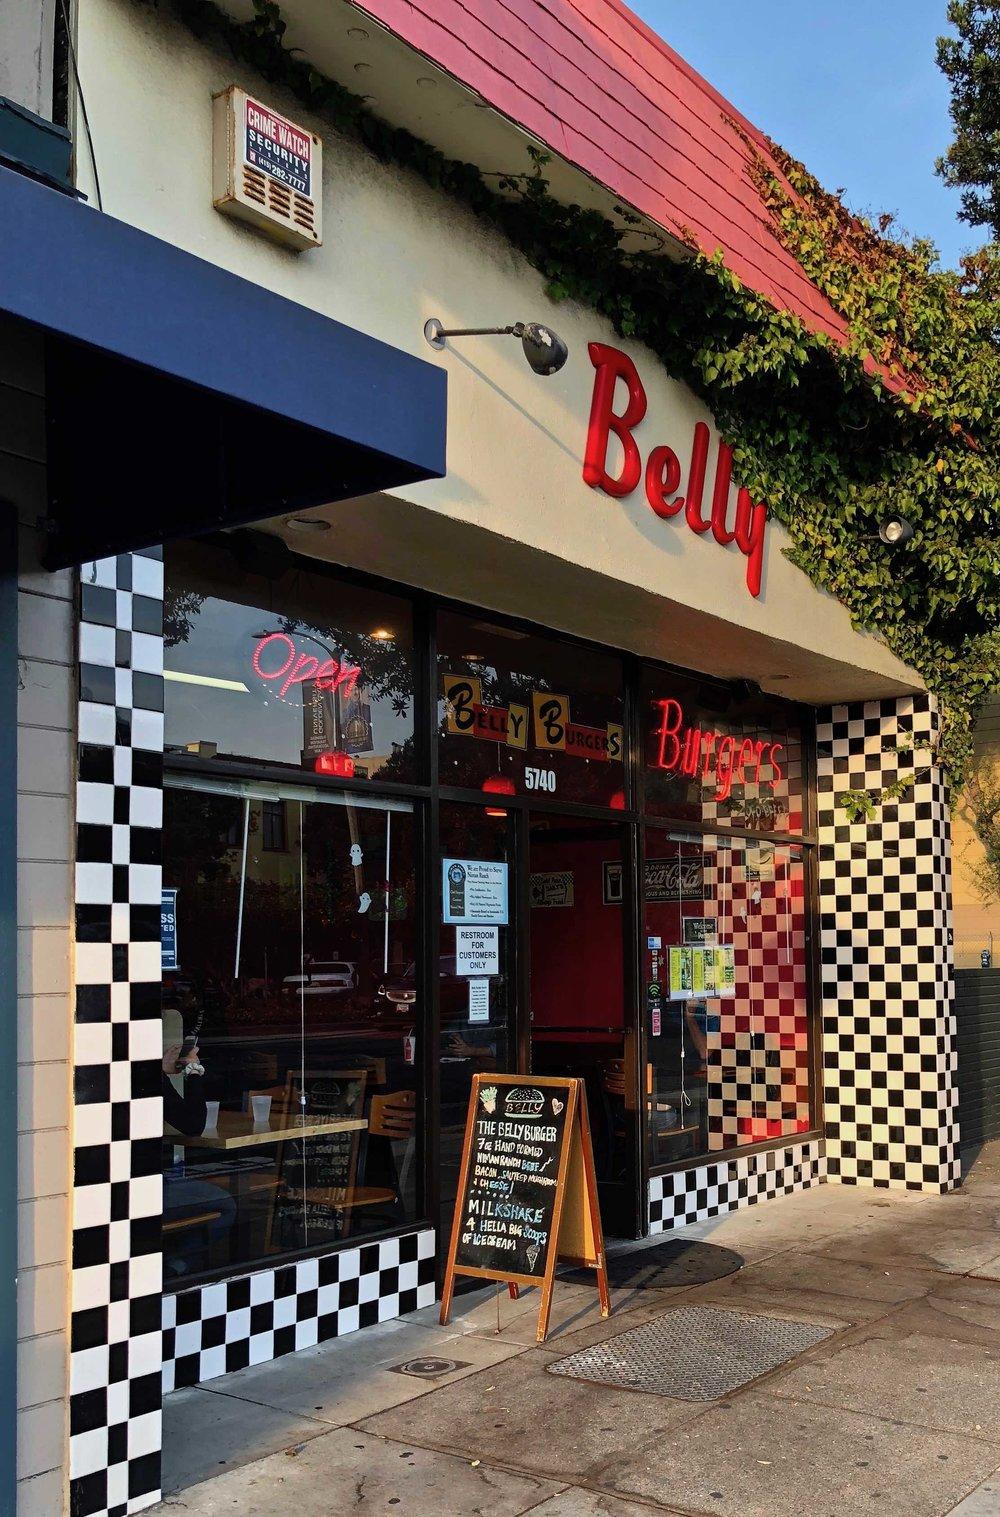 Belly Burger